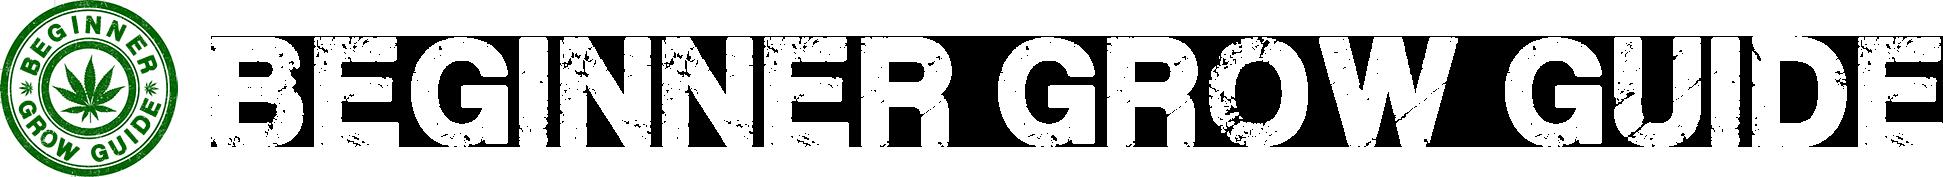 beginnergrowguide.com